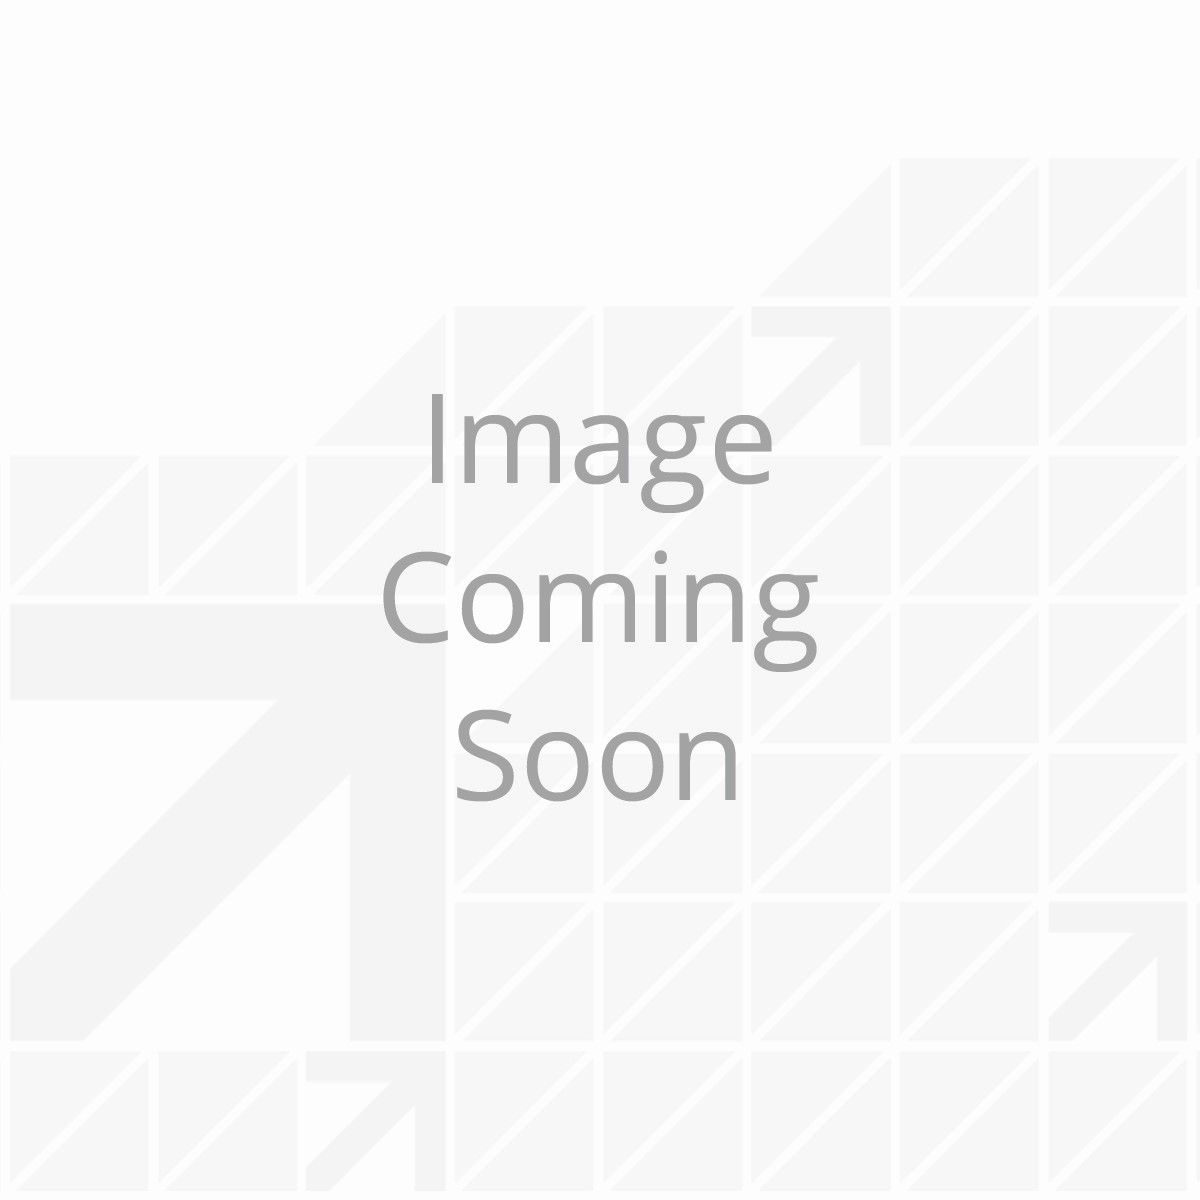 359465_-_pg_leveling_service_kit_-_001